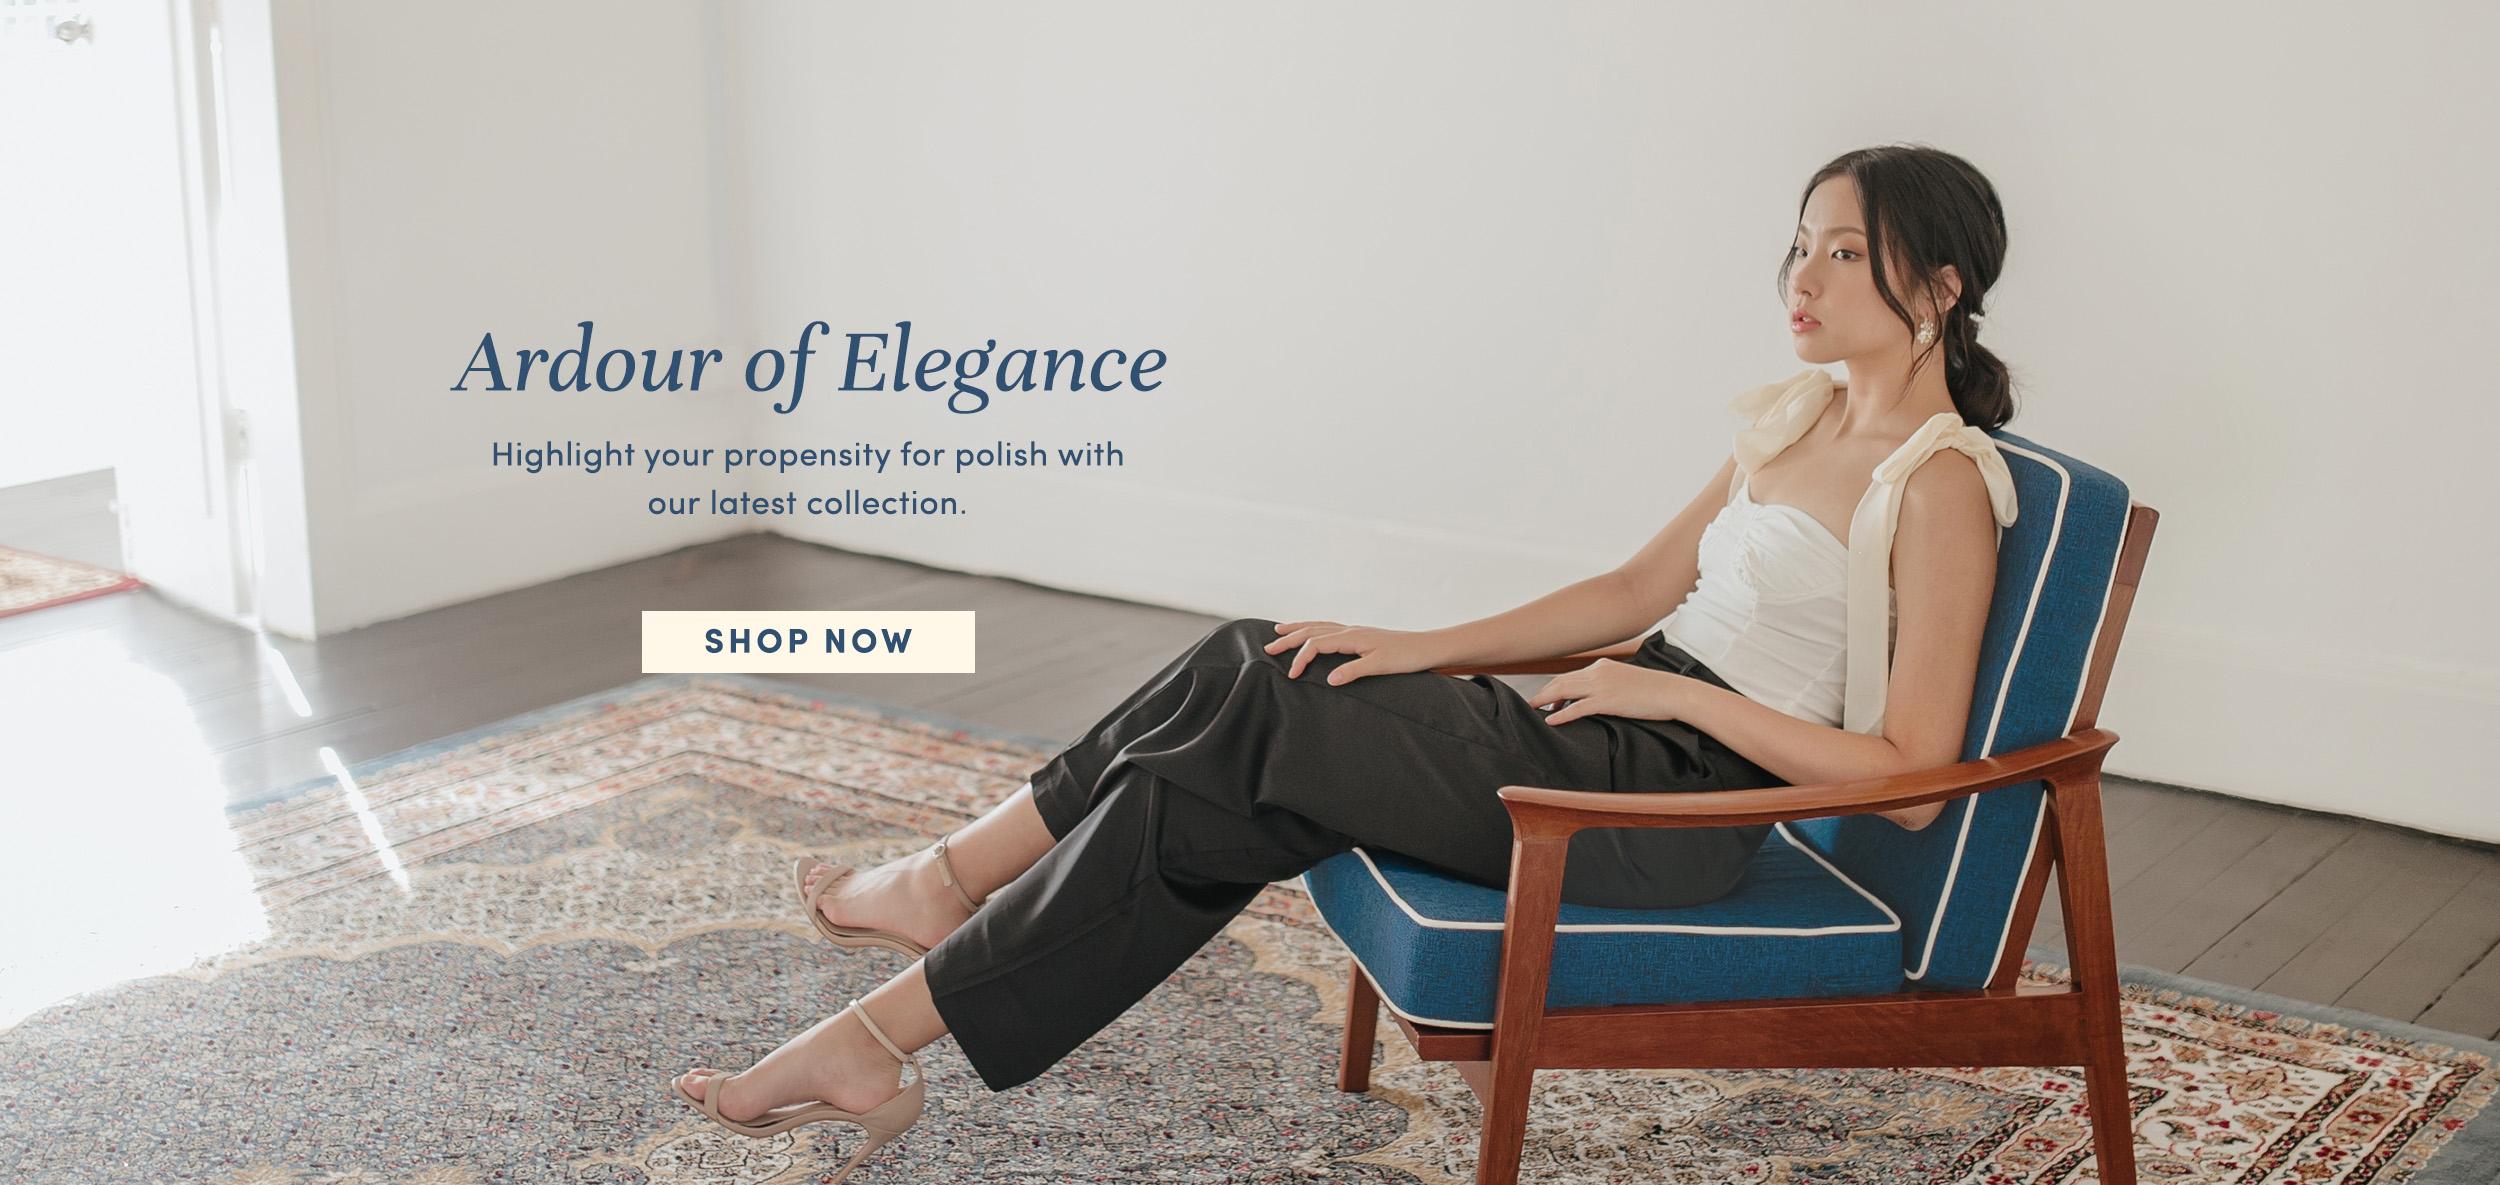 Ardour of Elegance